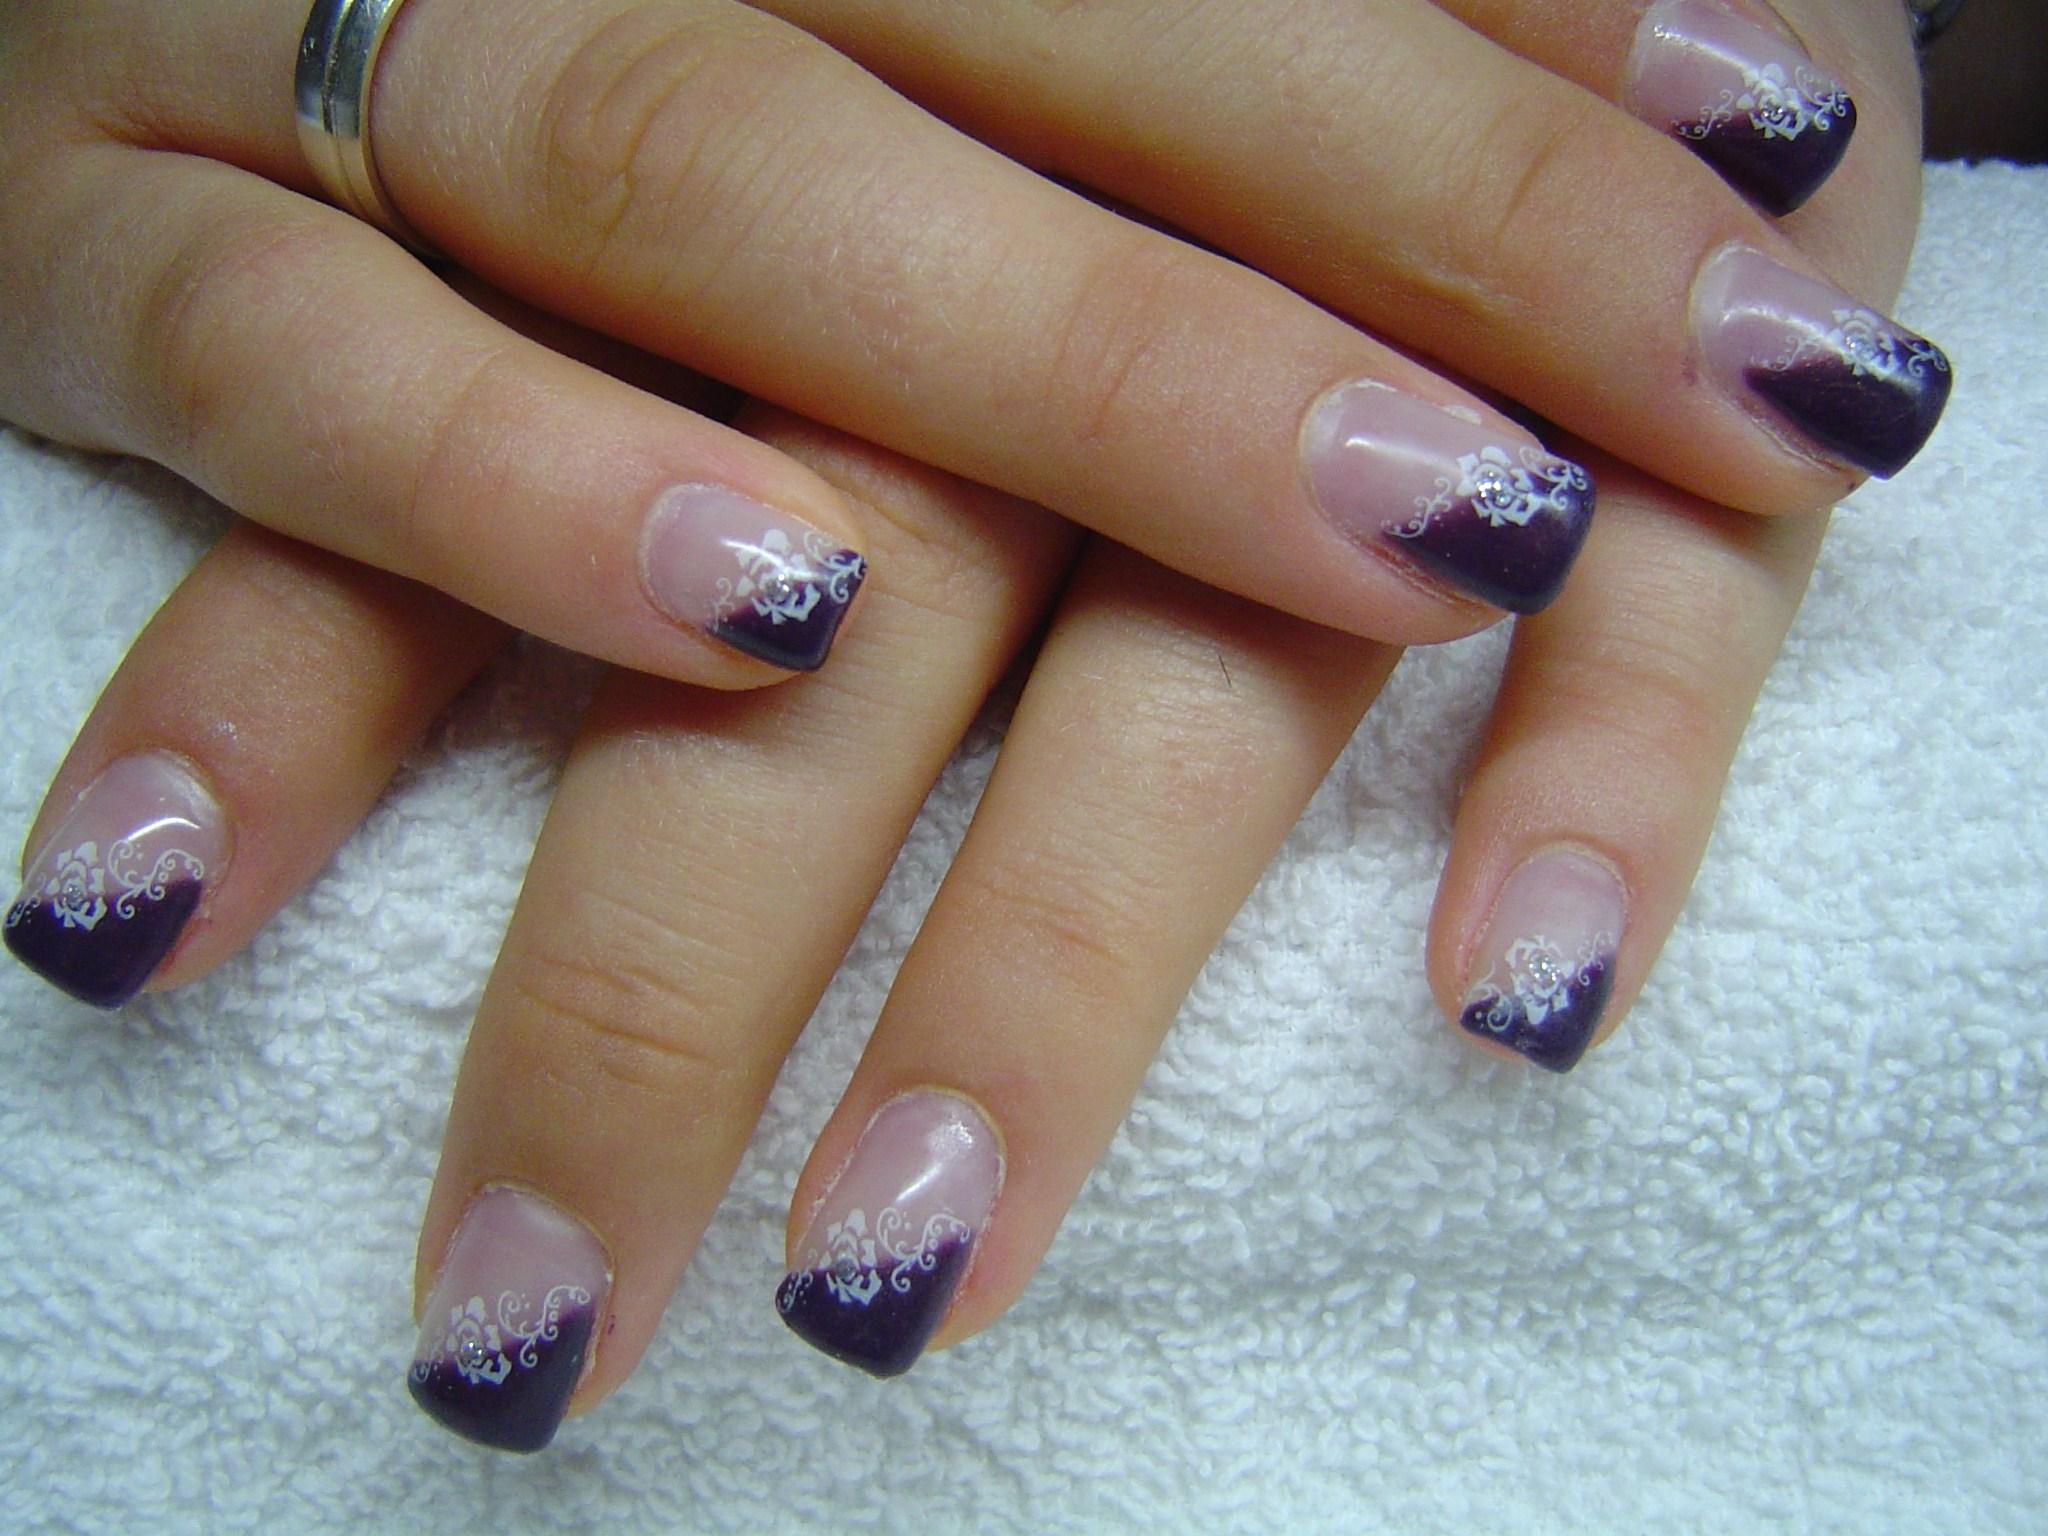 Diamond Nails - Wellness & Spa - Diamond Nails Galerie